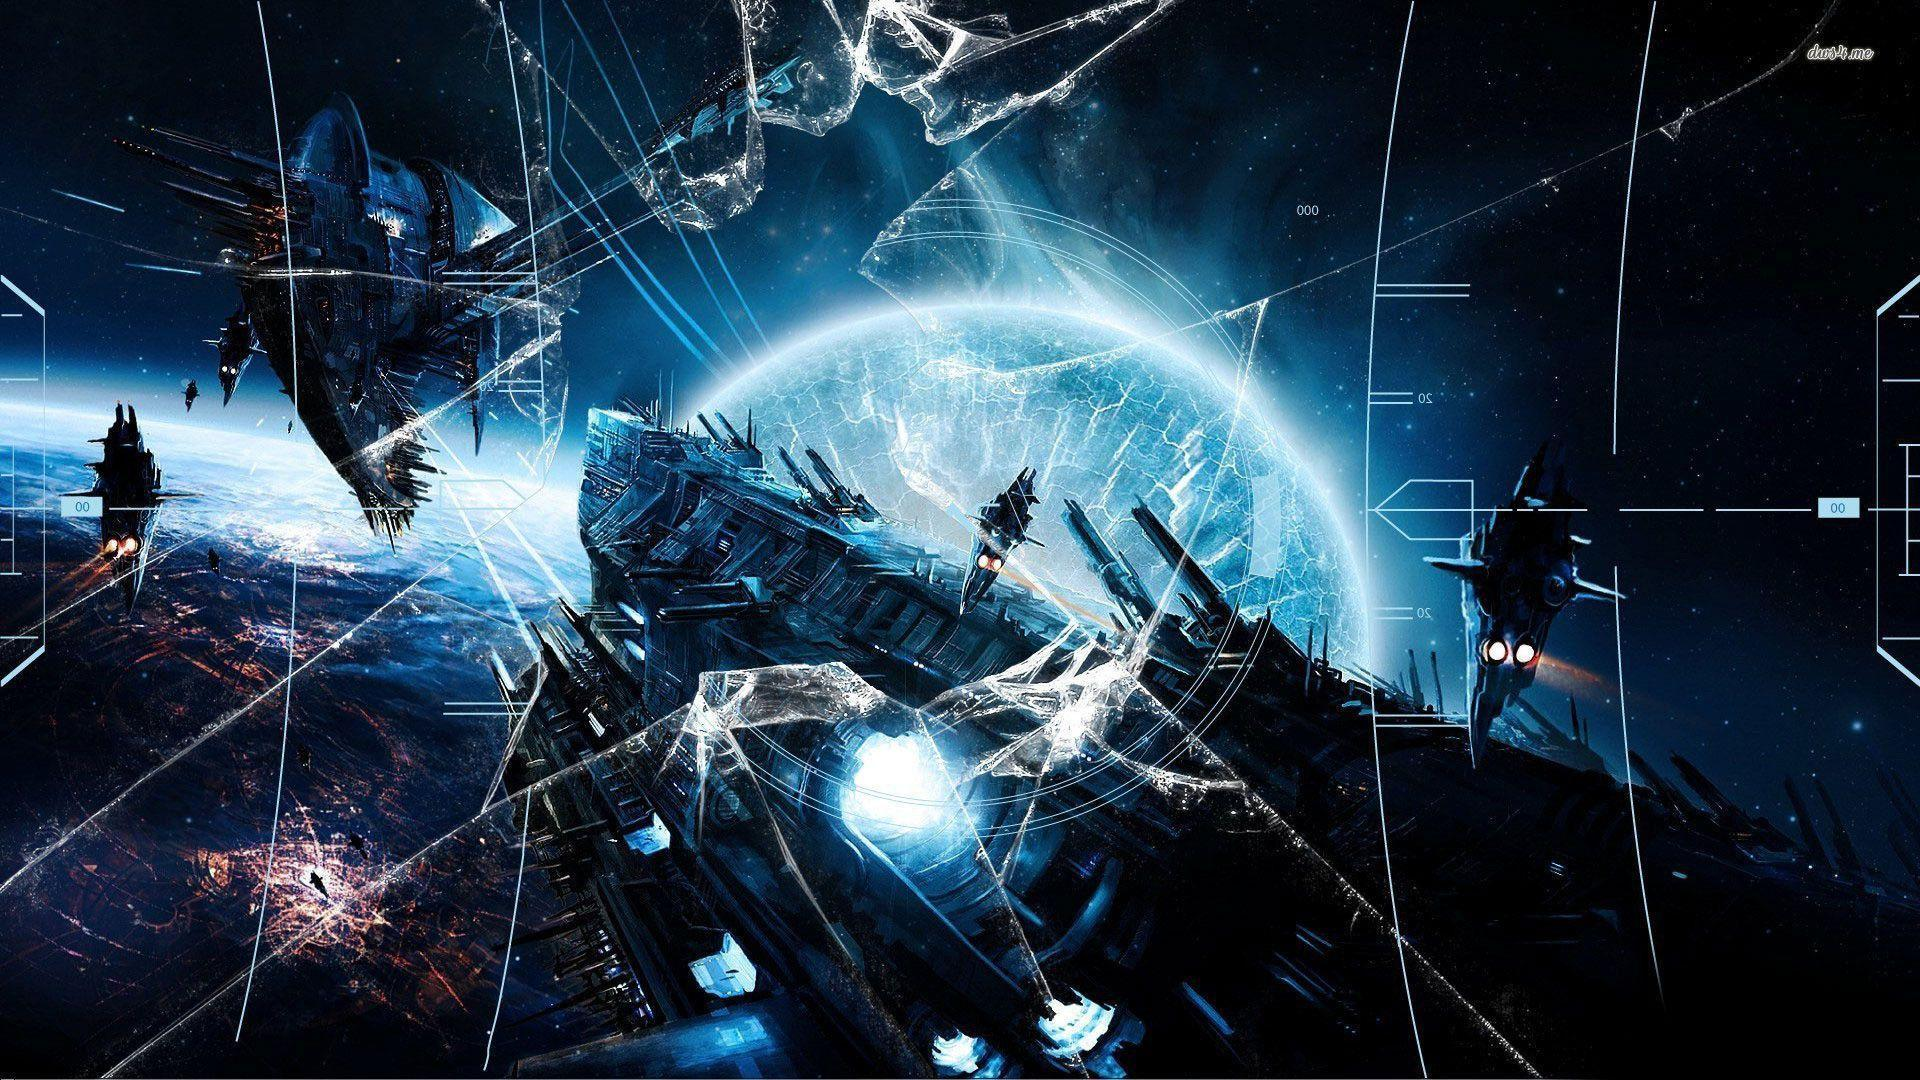 Spacewar! Wallpapers - Wallpaper Cave